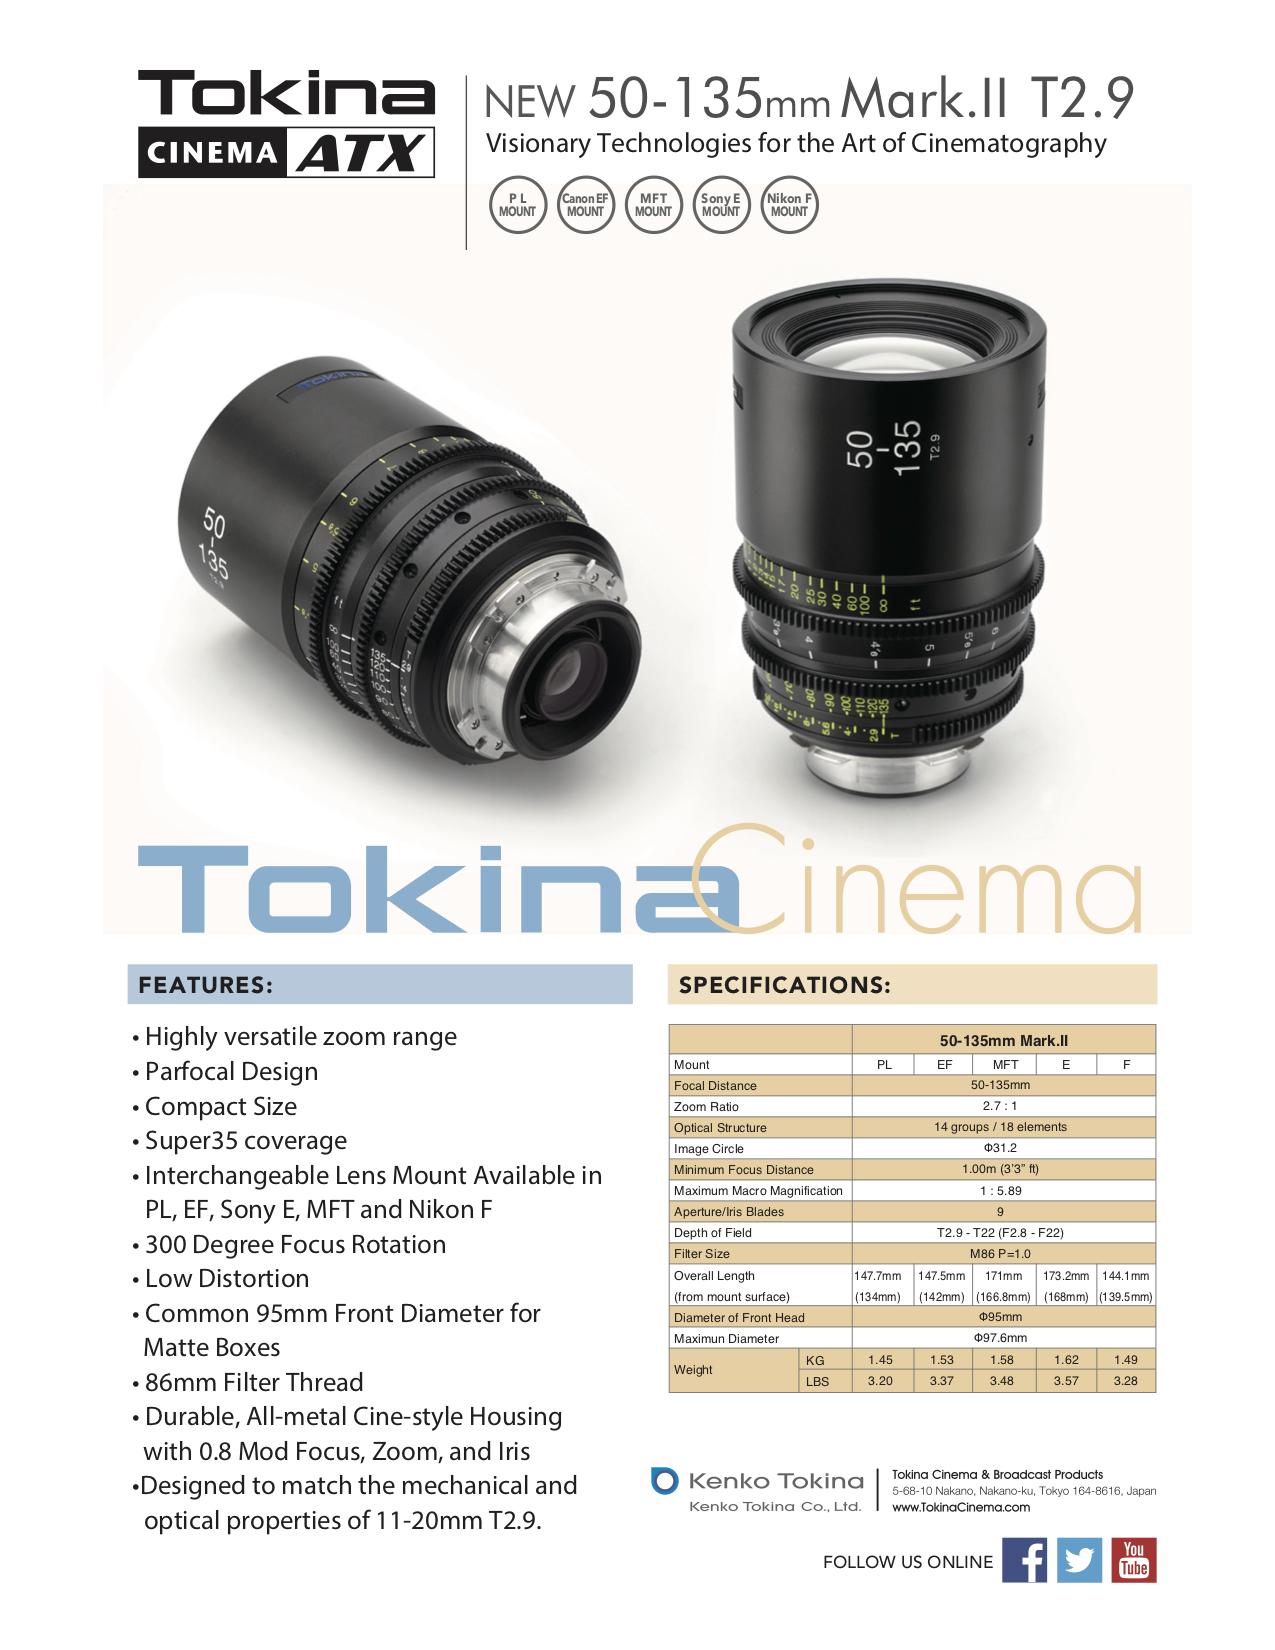 50-135mm T2.9 MKII Spec Sheet copy.jpg